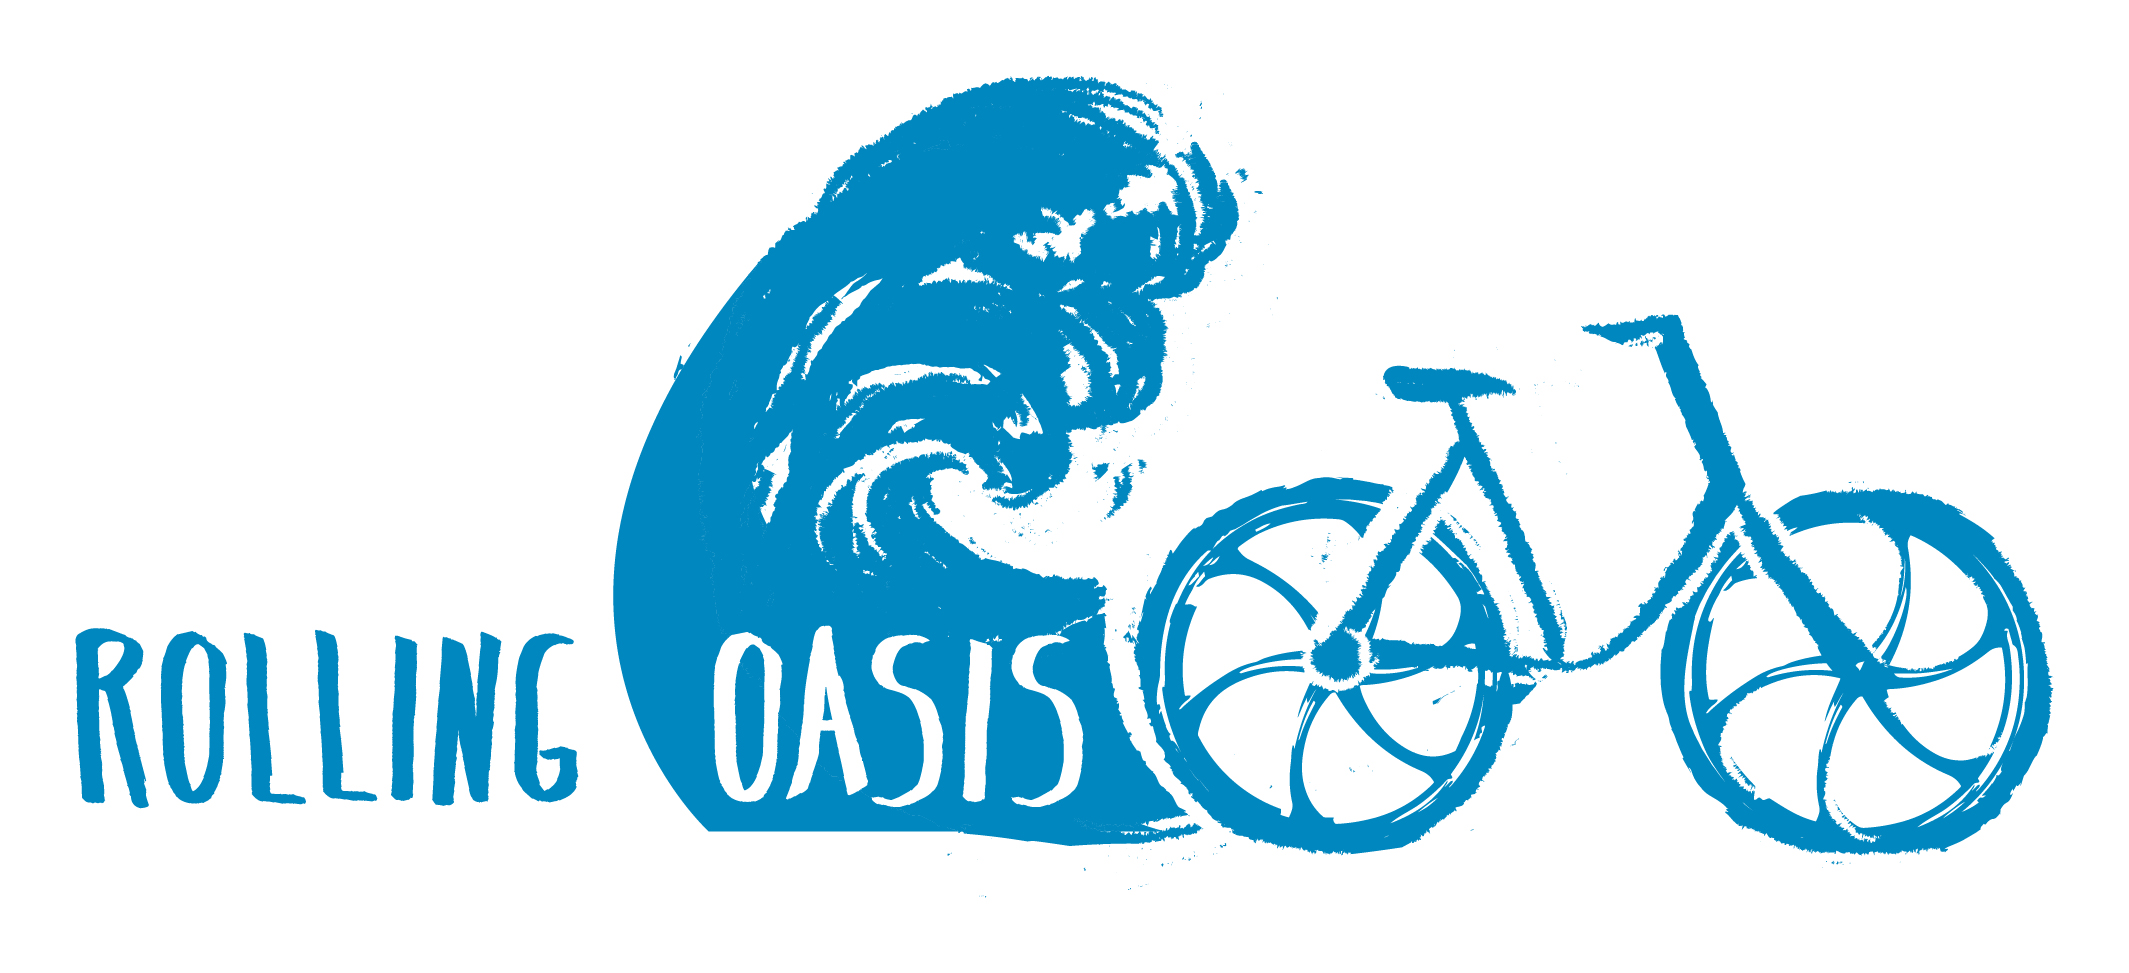 rollingoasis-logos-FNL_Rolling Oasis Logo A.jpg